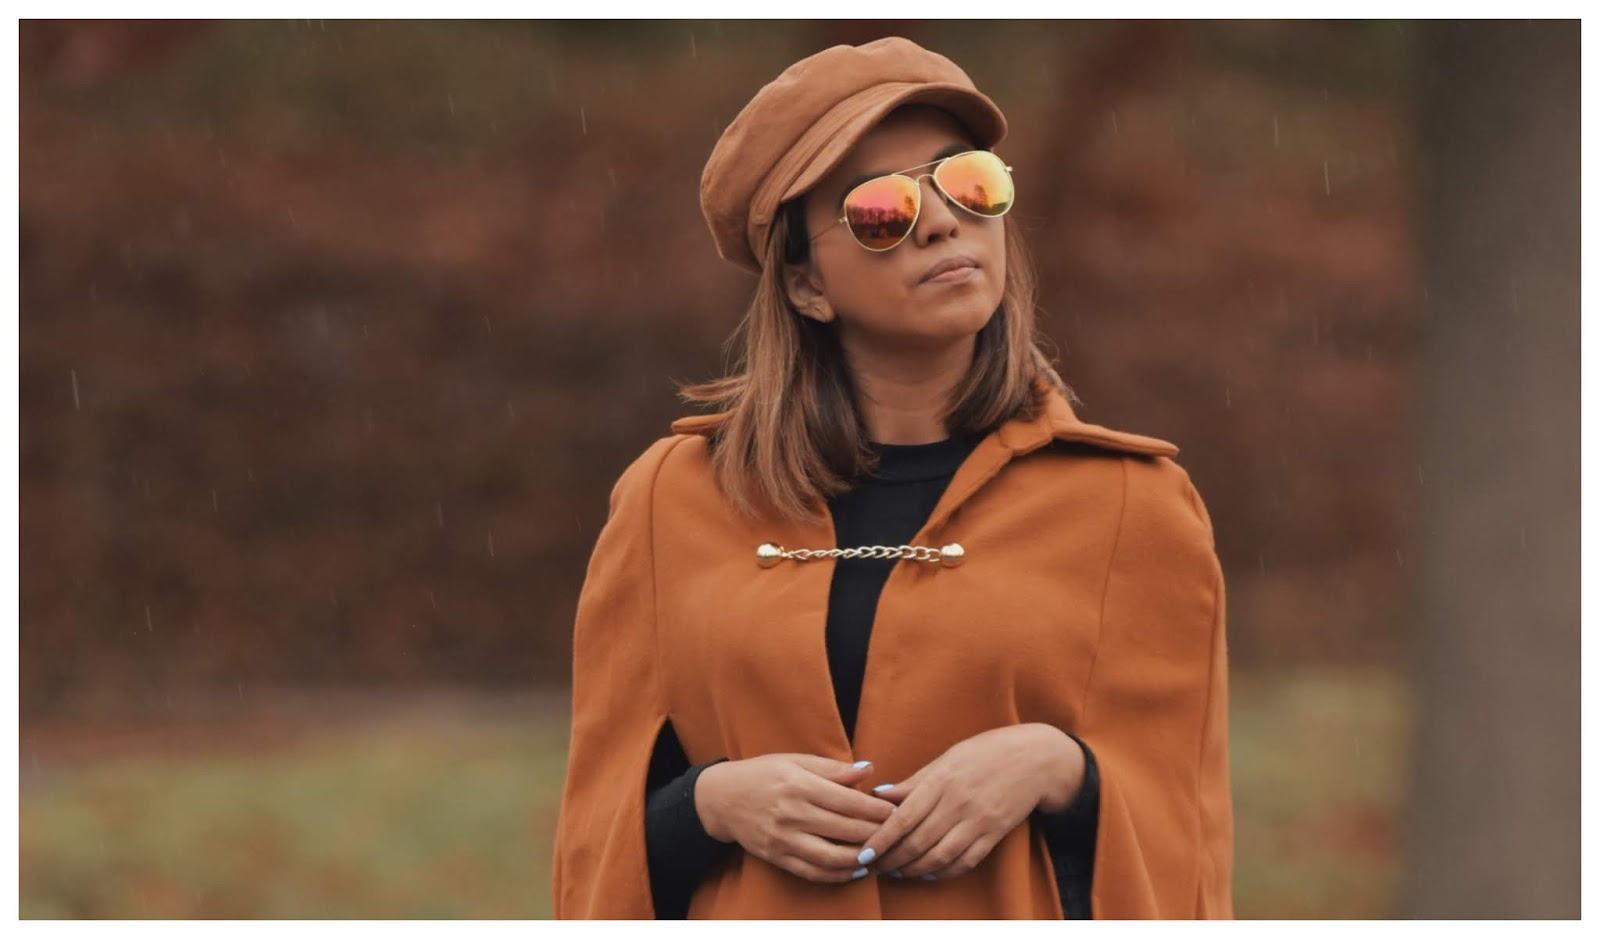 Mis Favoritos De SheIn Para La Temporada - Cyber Monday by Mari Estilo-dcblogger-streetwear-moda-canal de mariestilo-youtuber-how to wear a capa-fall 2019-winter 2020-dcblogger-canal de mariestilo-youtuber-